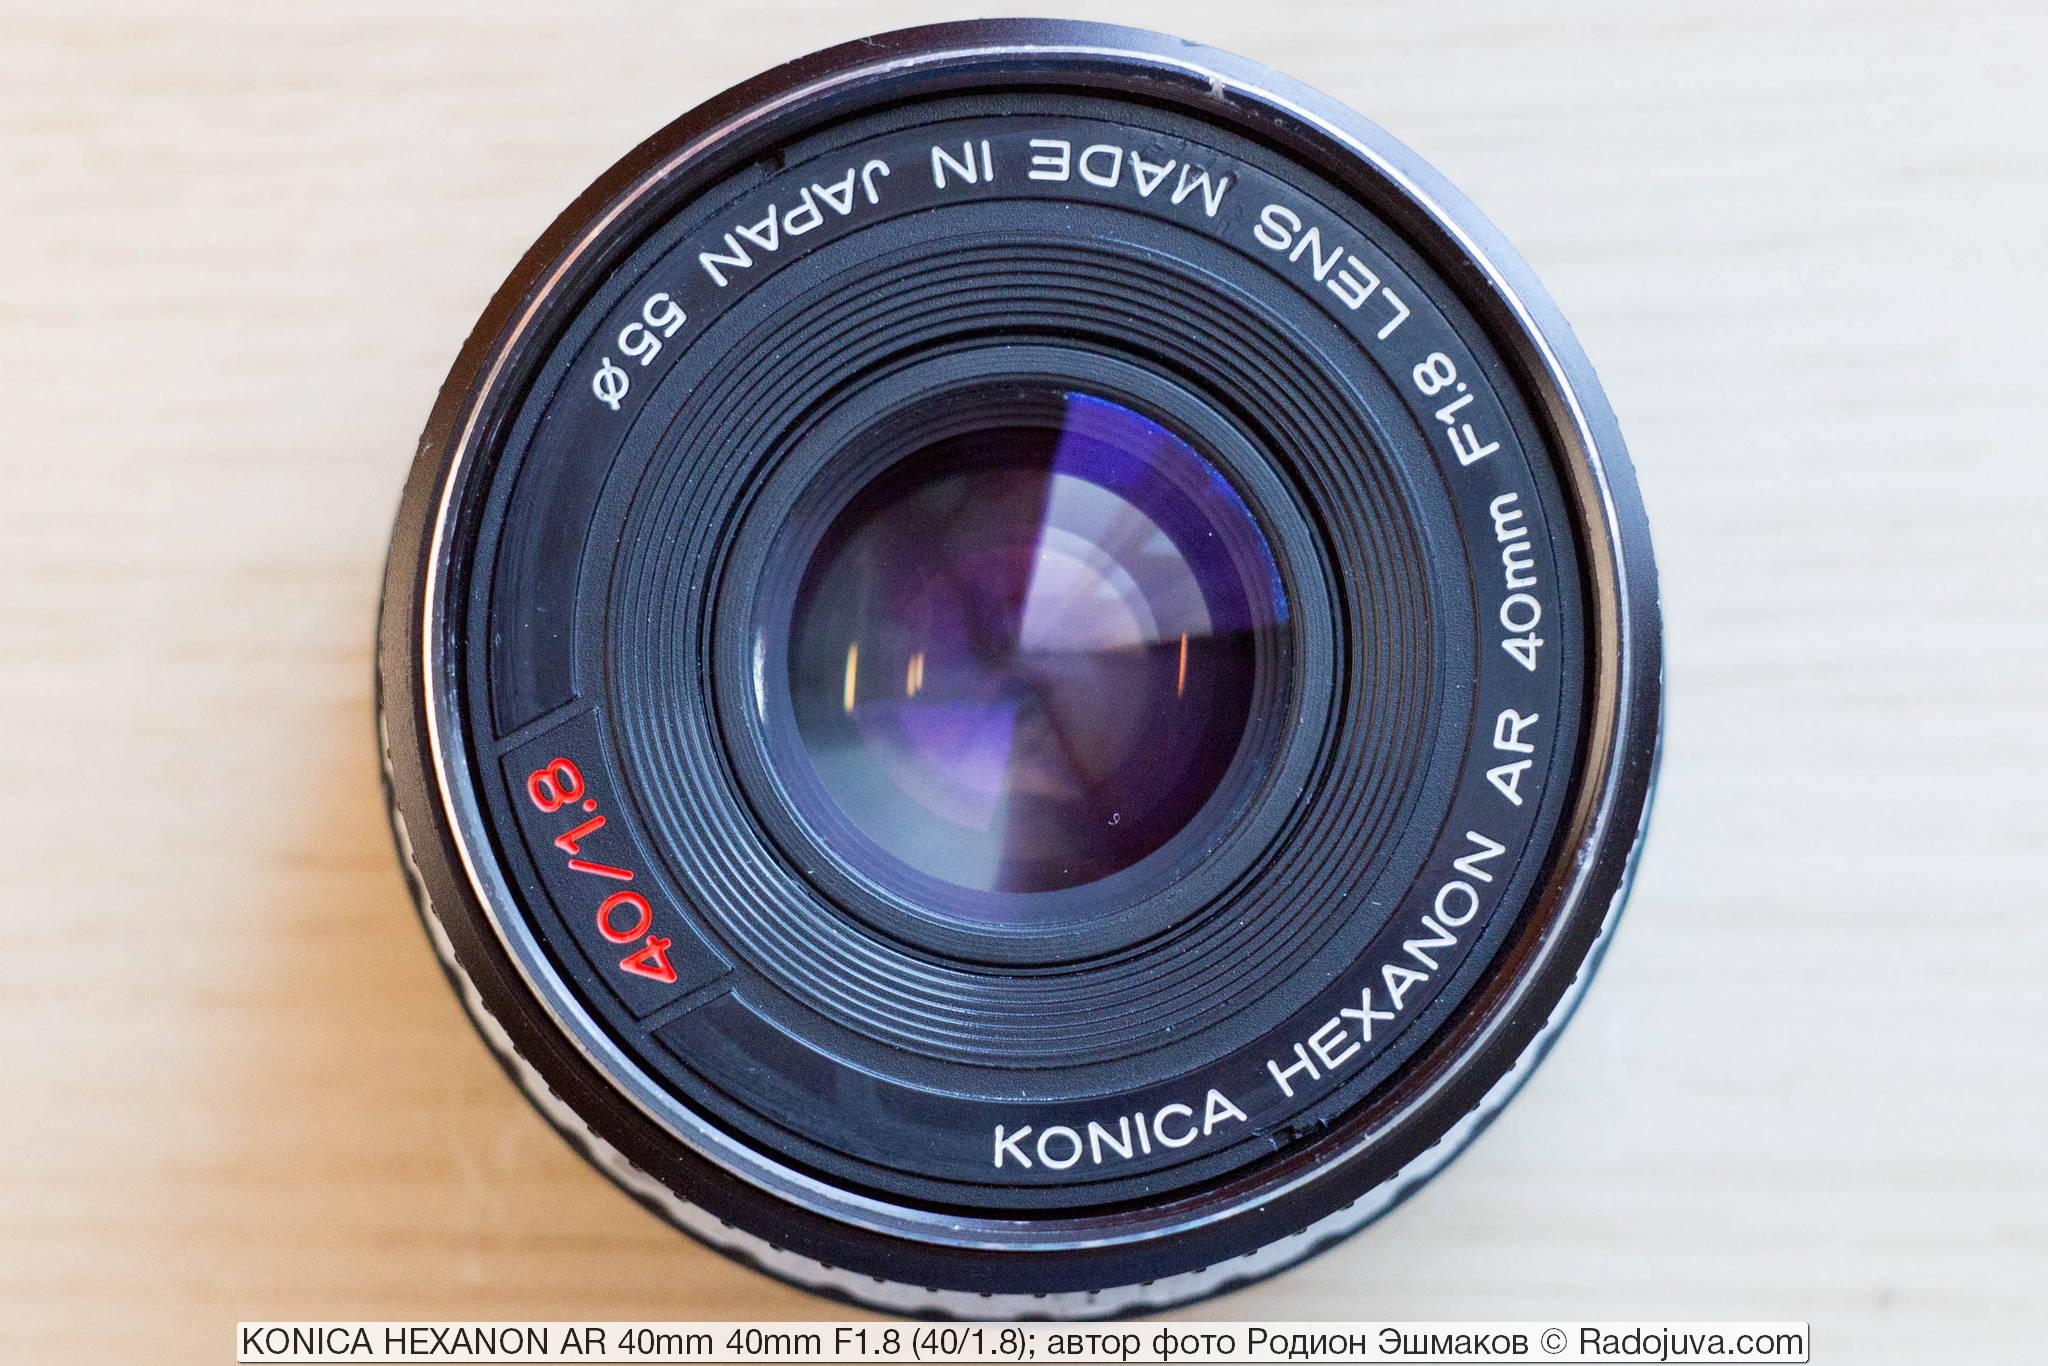 KONICA HEXANON AR 40mm 40mm F1.8 (40/1.8)